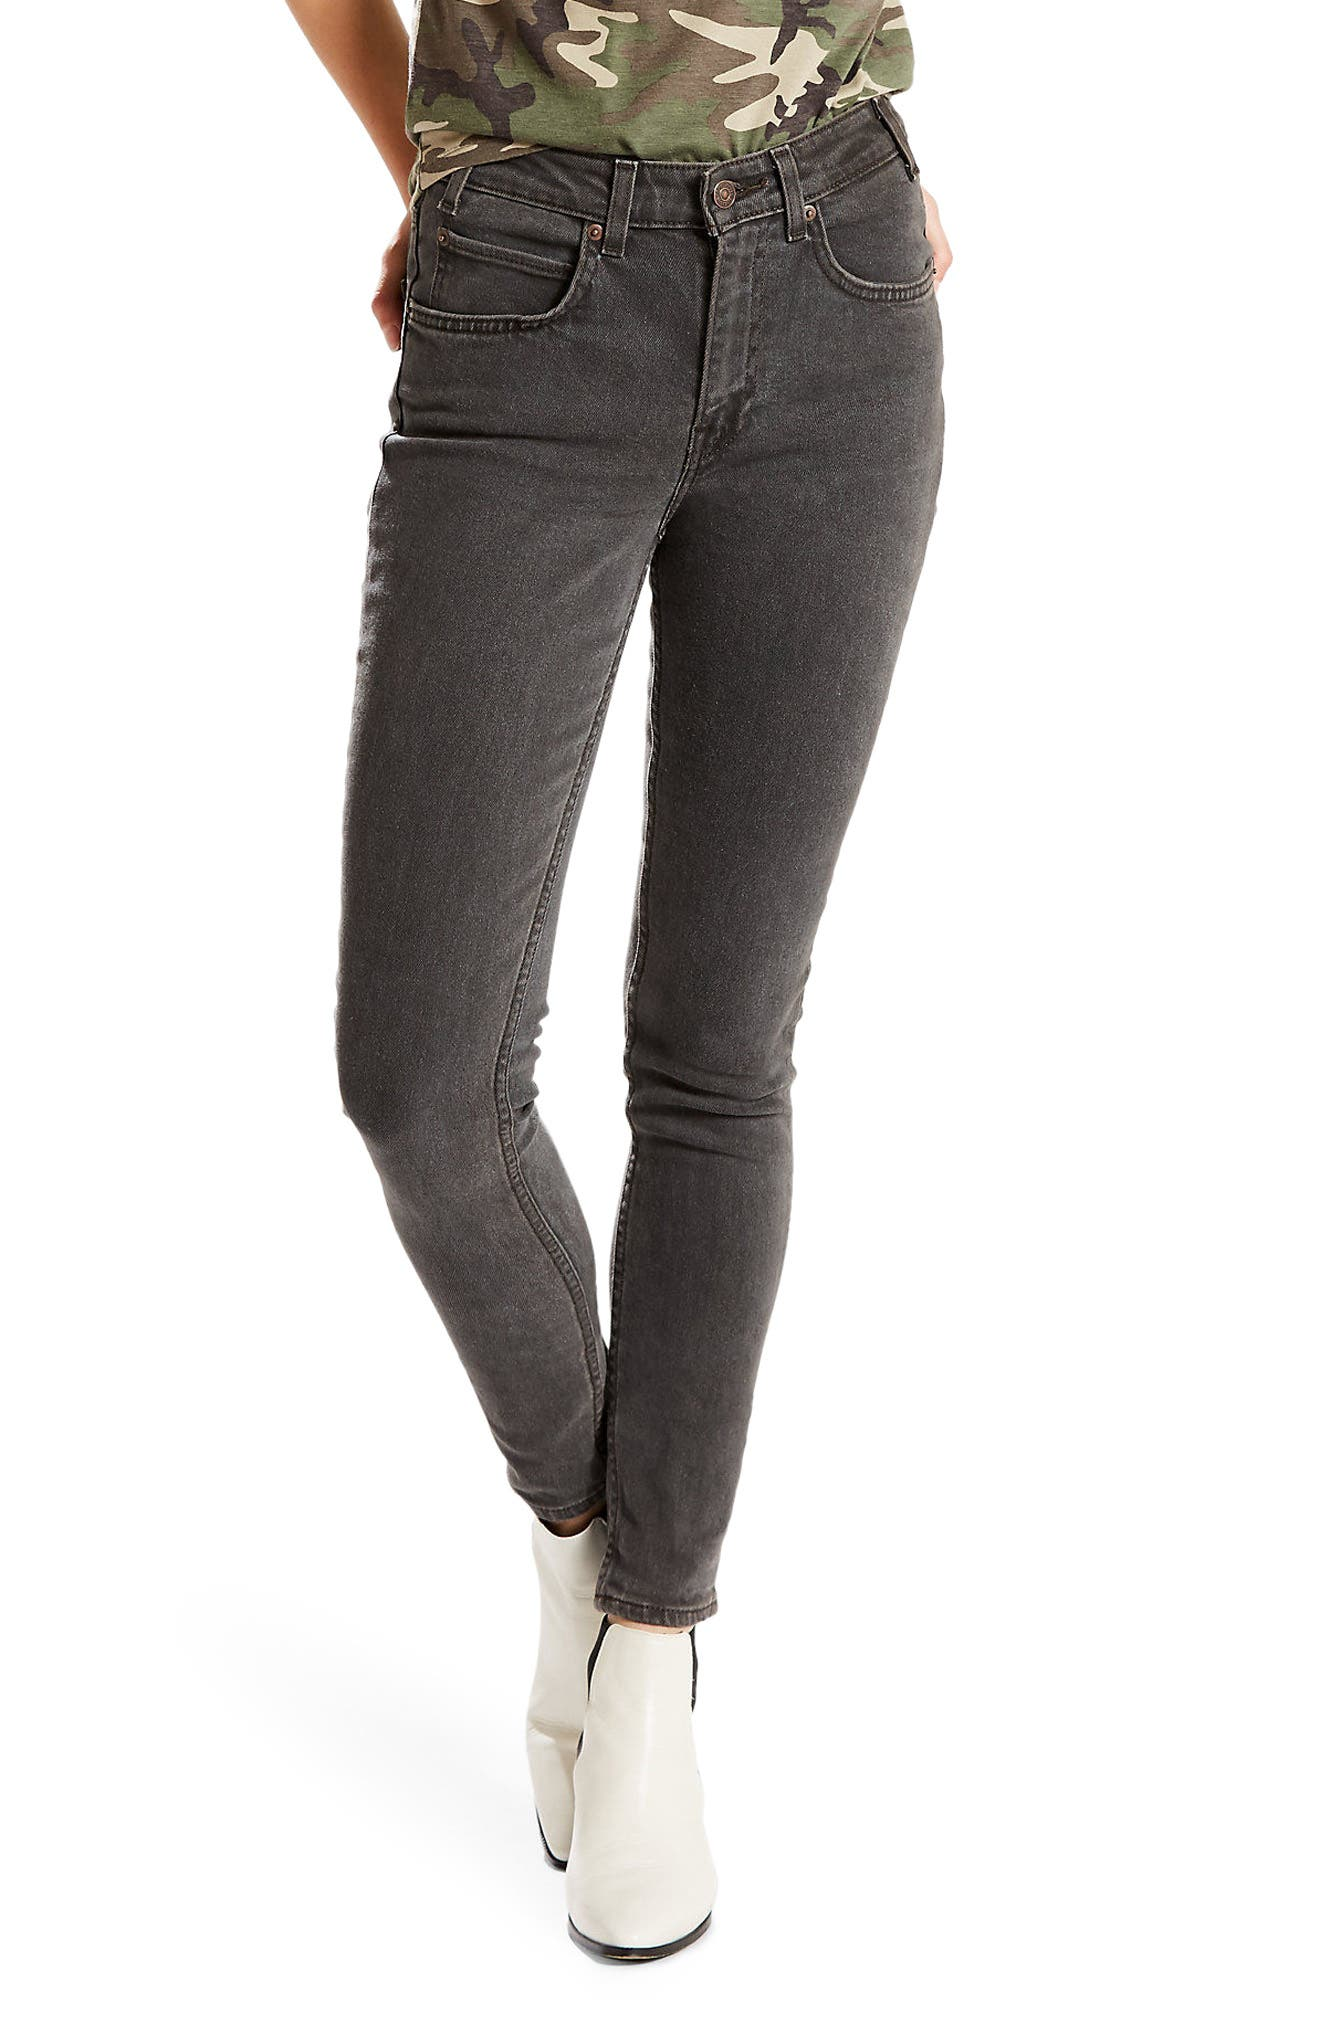 Main Image - Levi's® Orange Tab 721 High Waist Skinny Jeans (Black Widow)